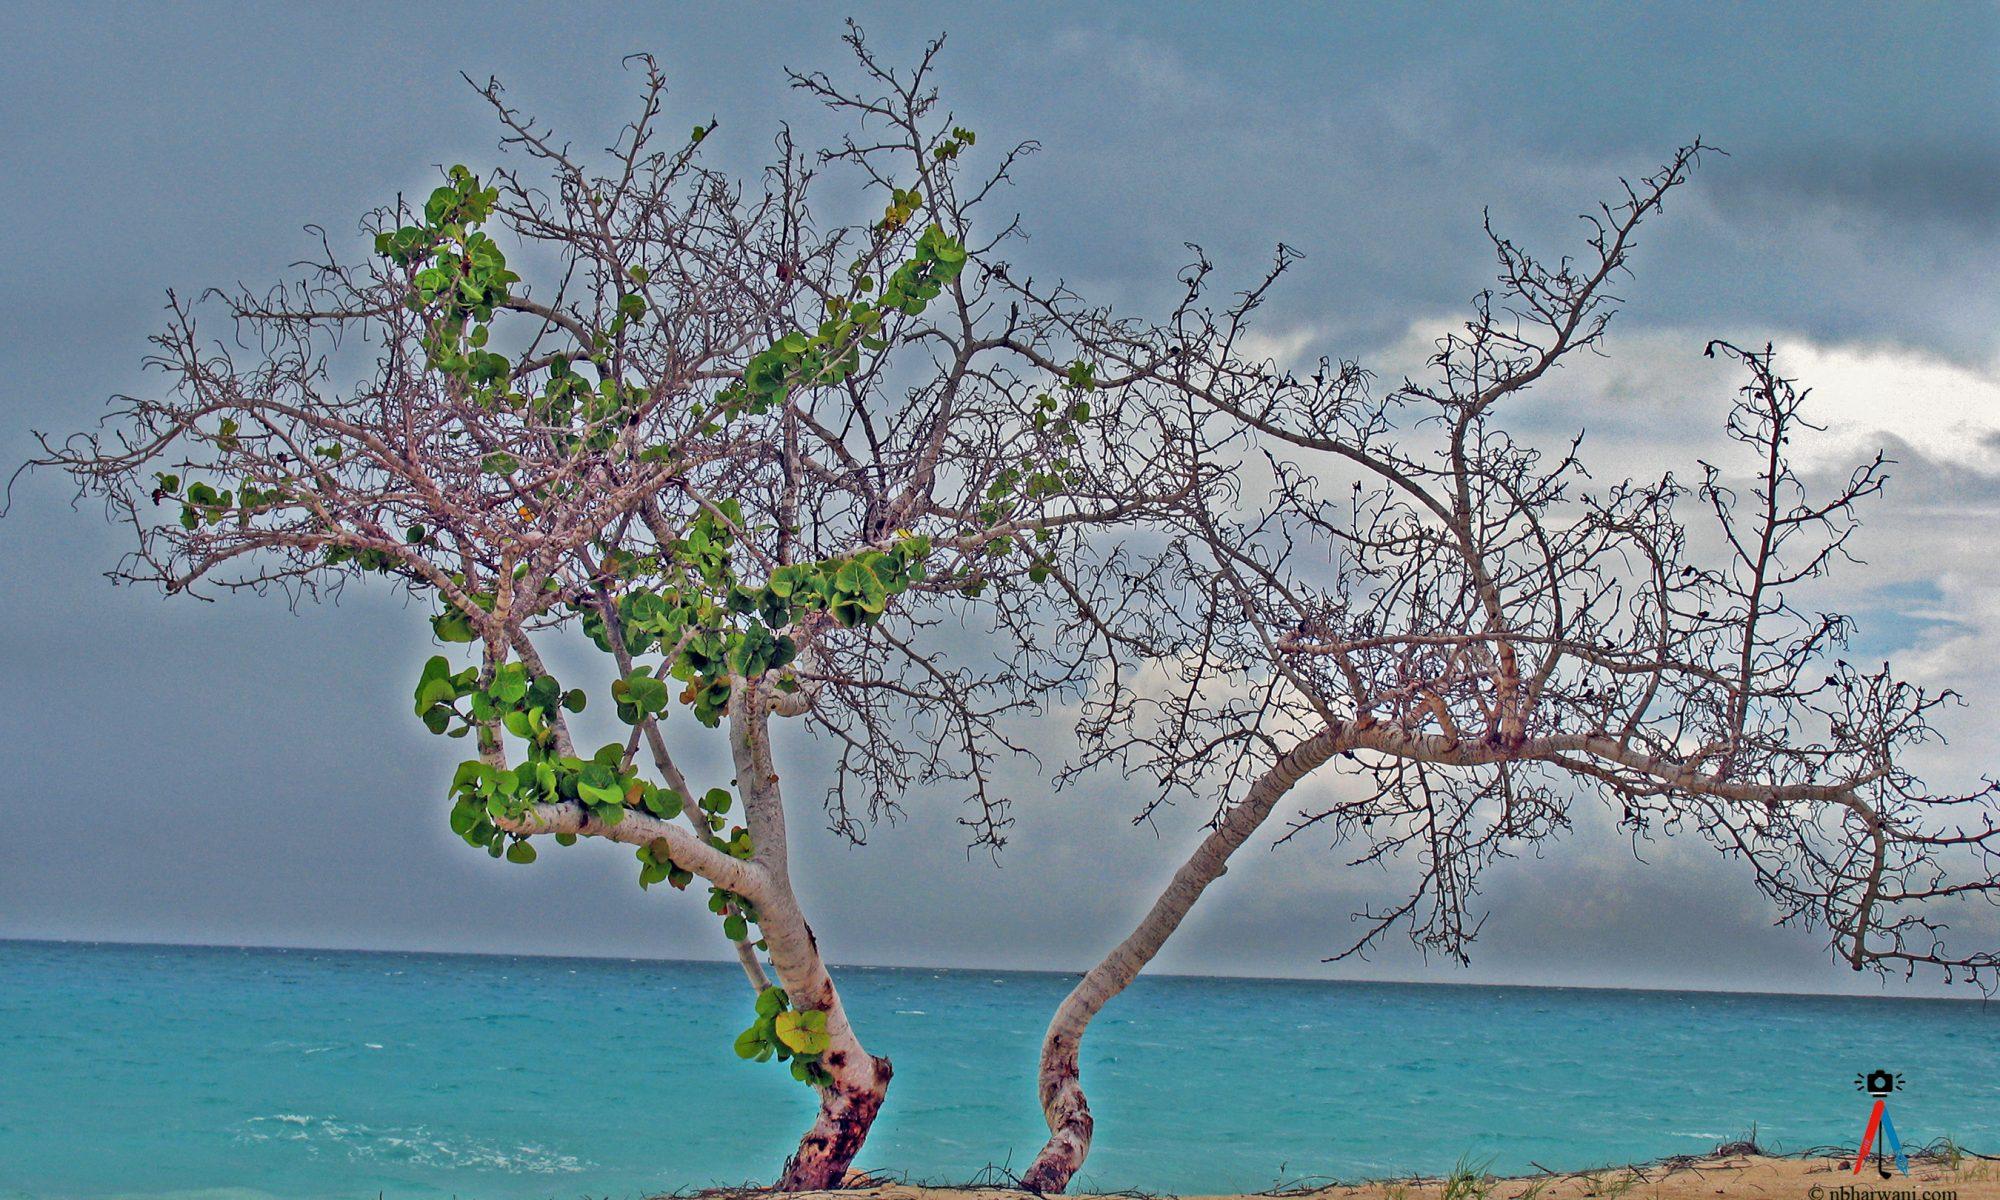 Antigua (Dr. Noorali Bharwani)